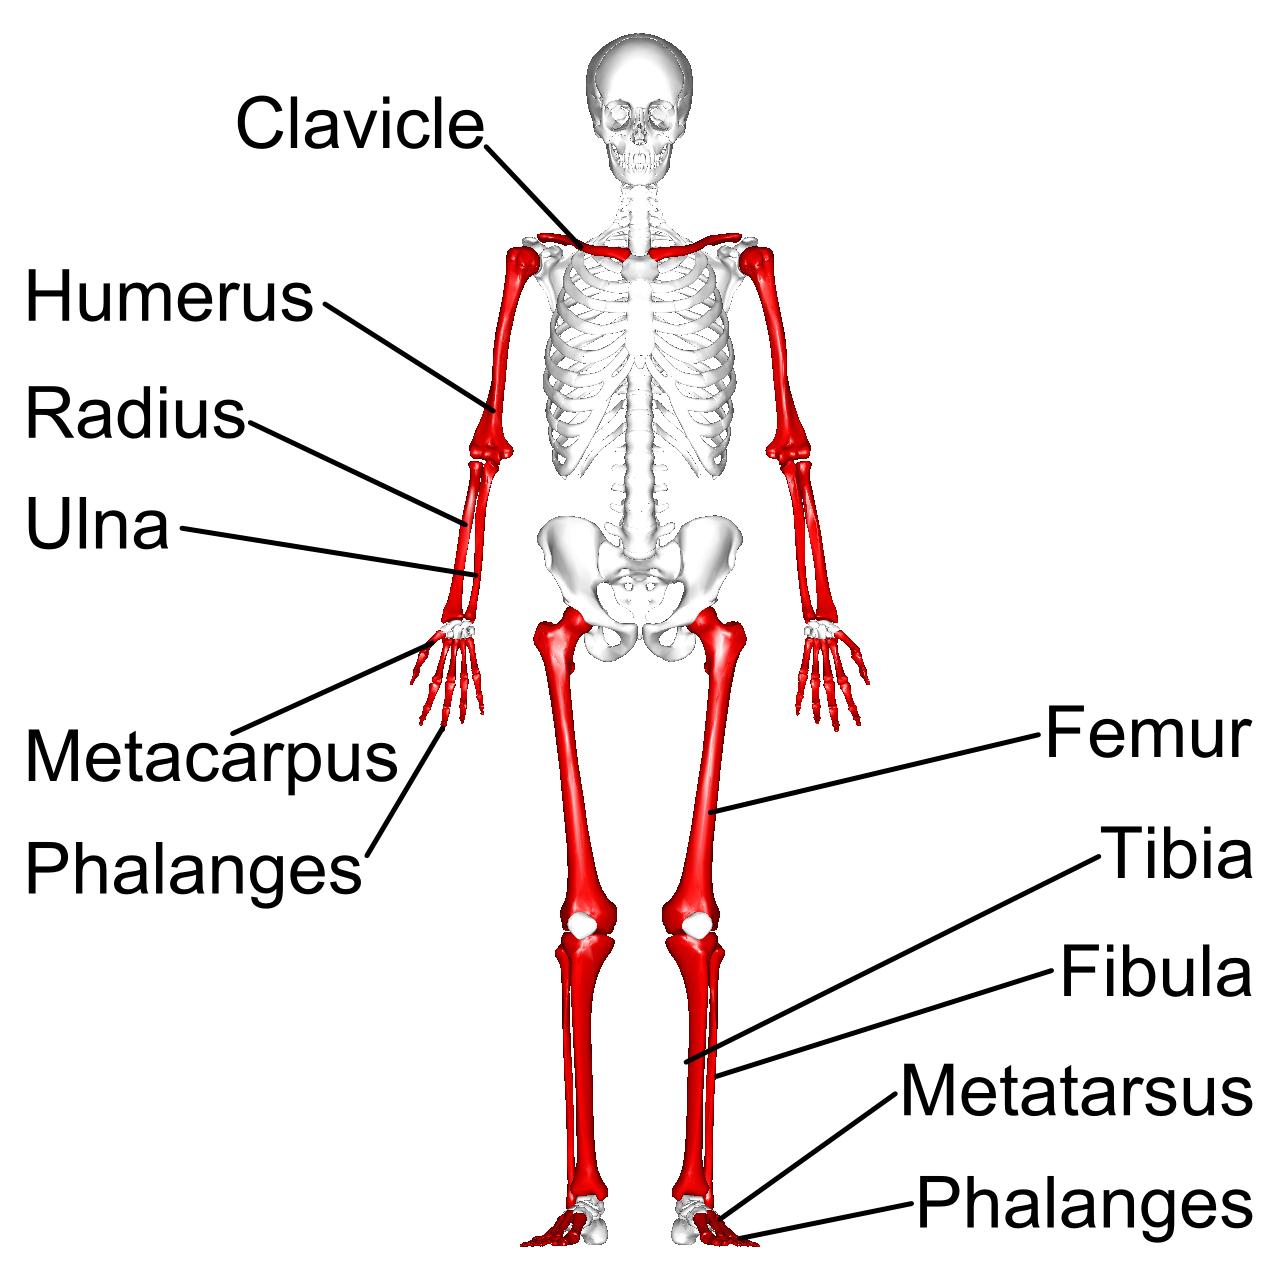 human long bone diagram bmw e91 radio wiring jeep light free download schematic on